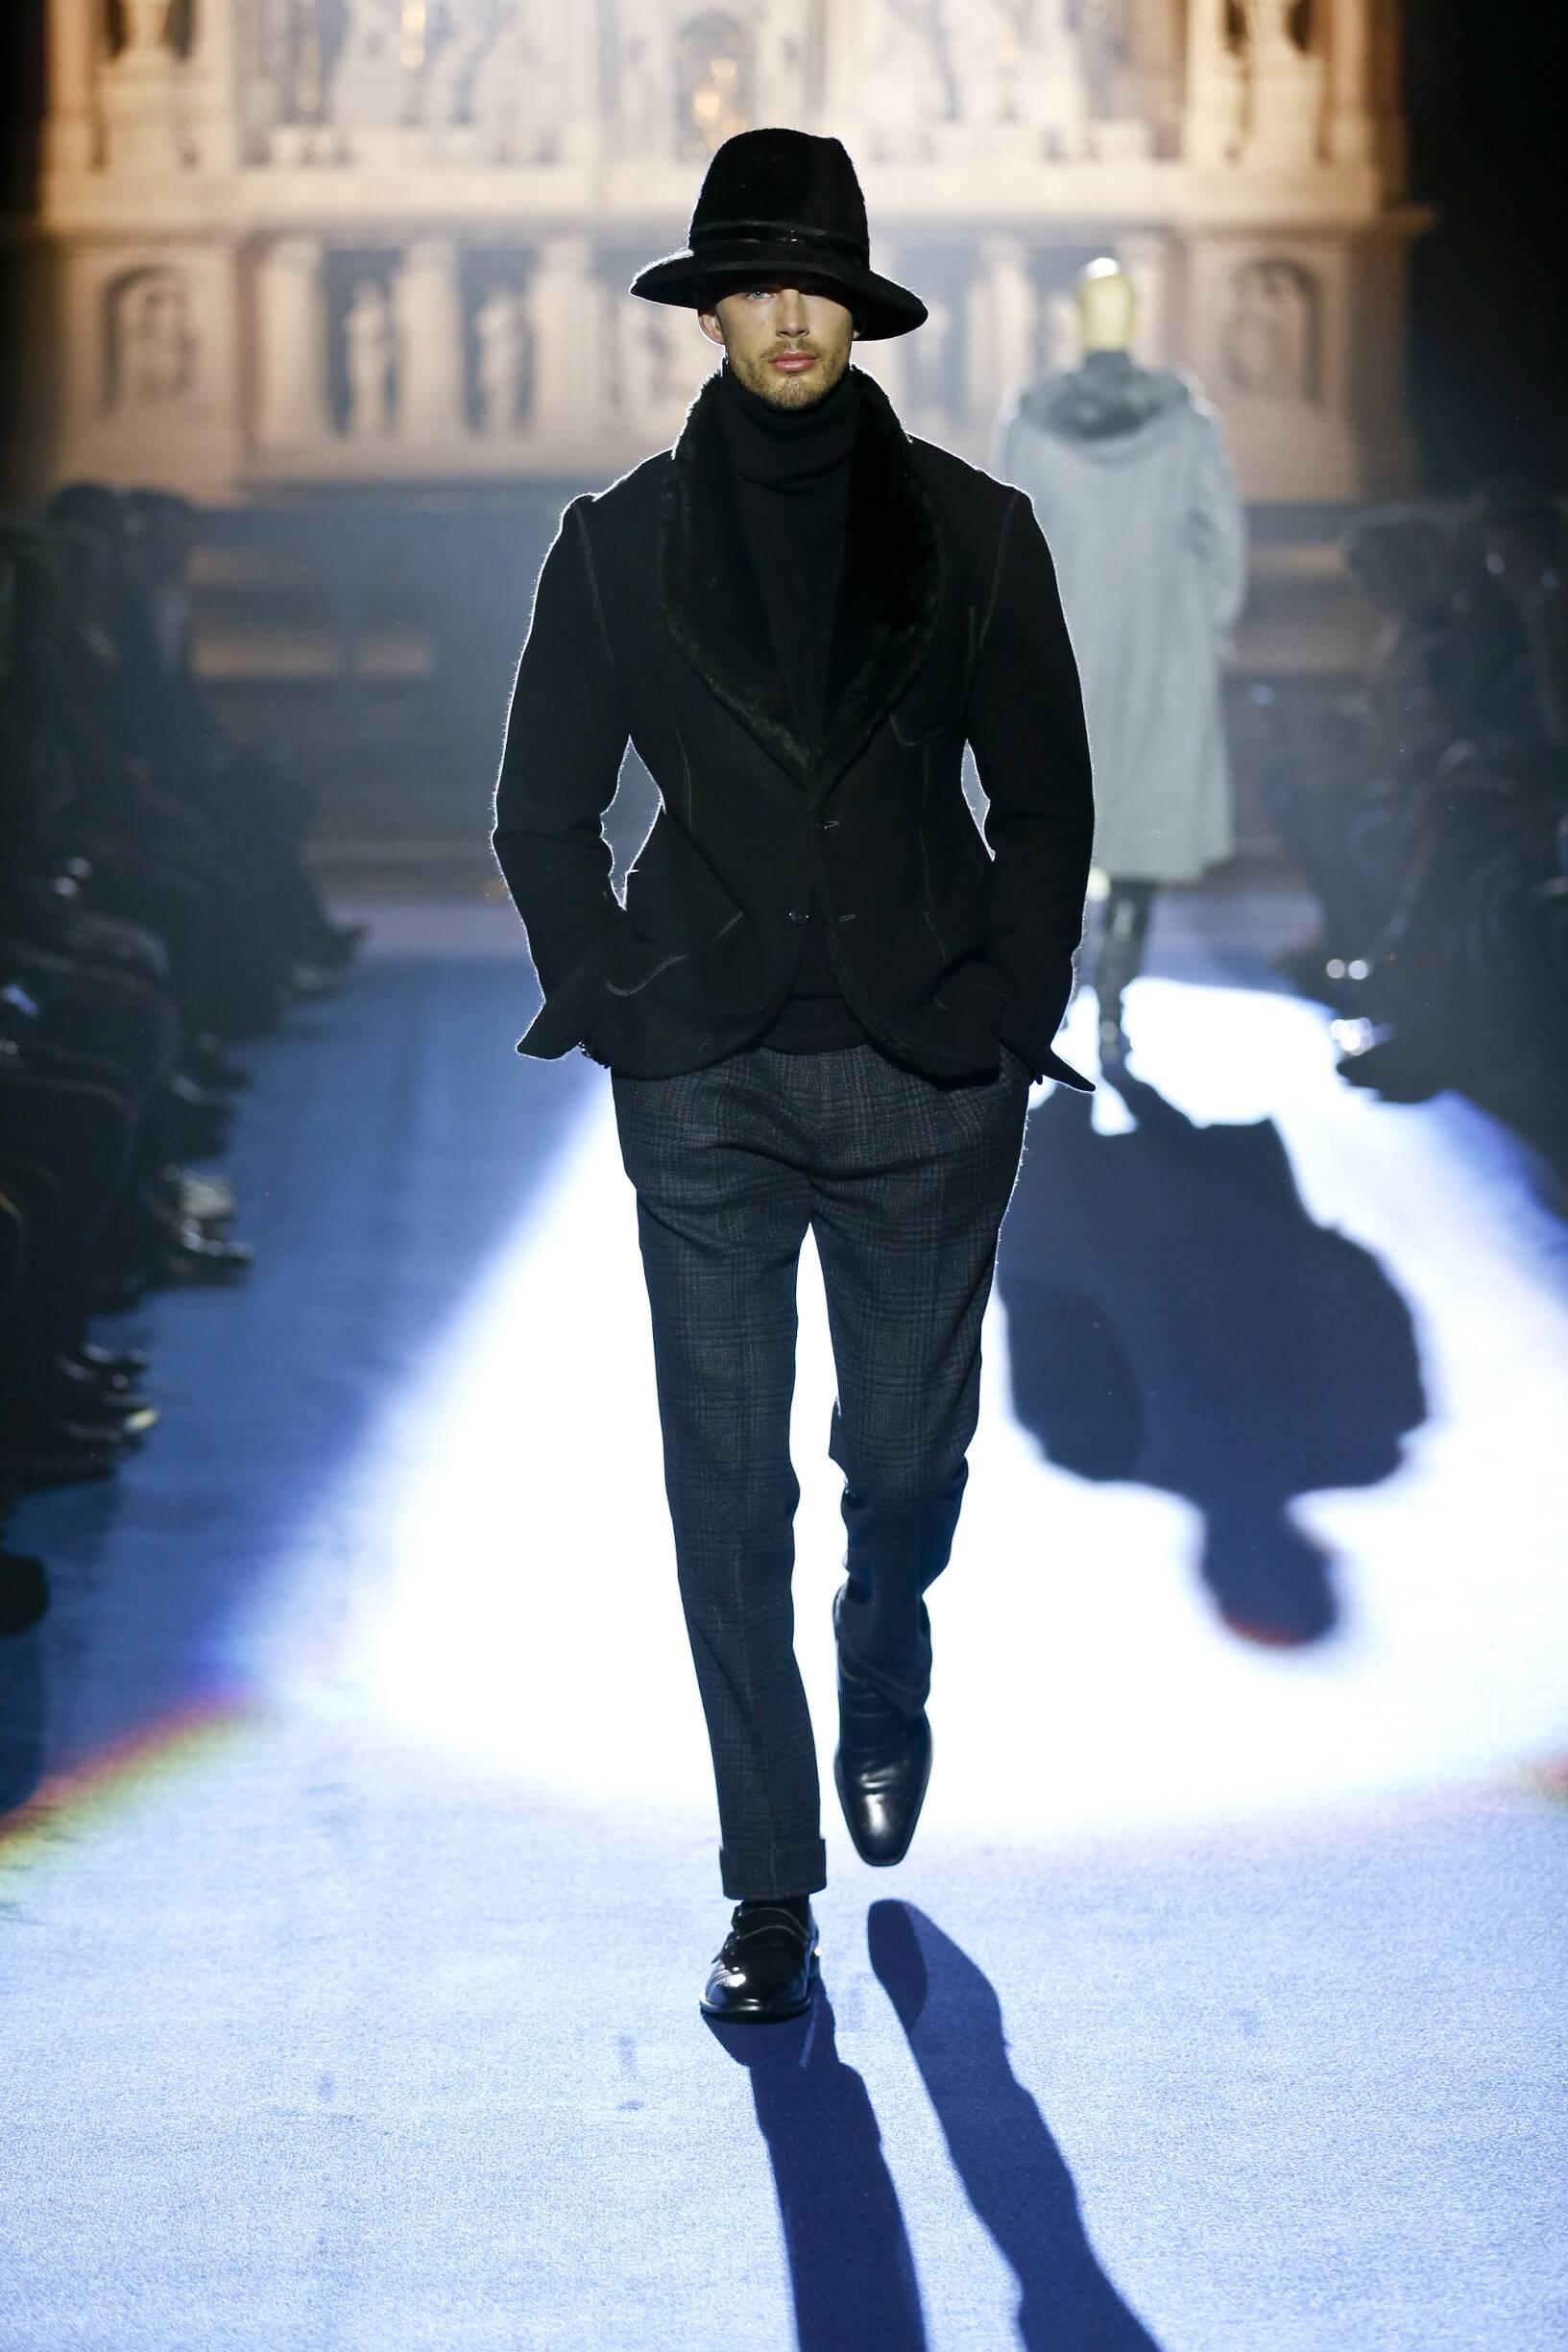 Joseph Abboud Man Catwalk